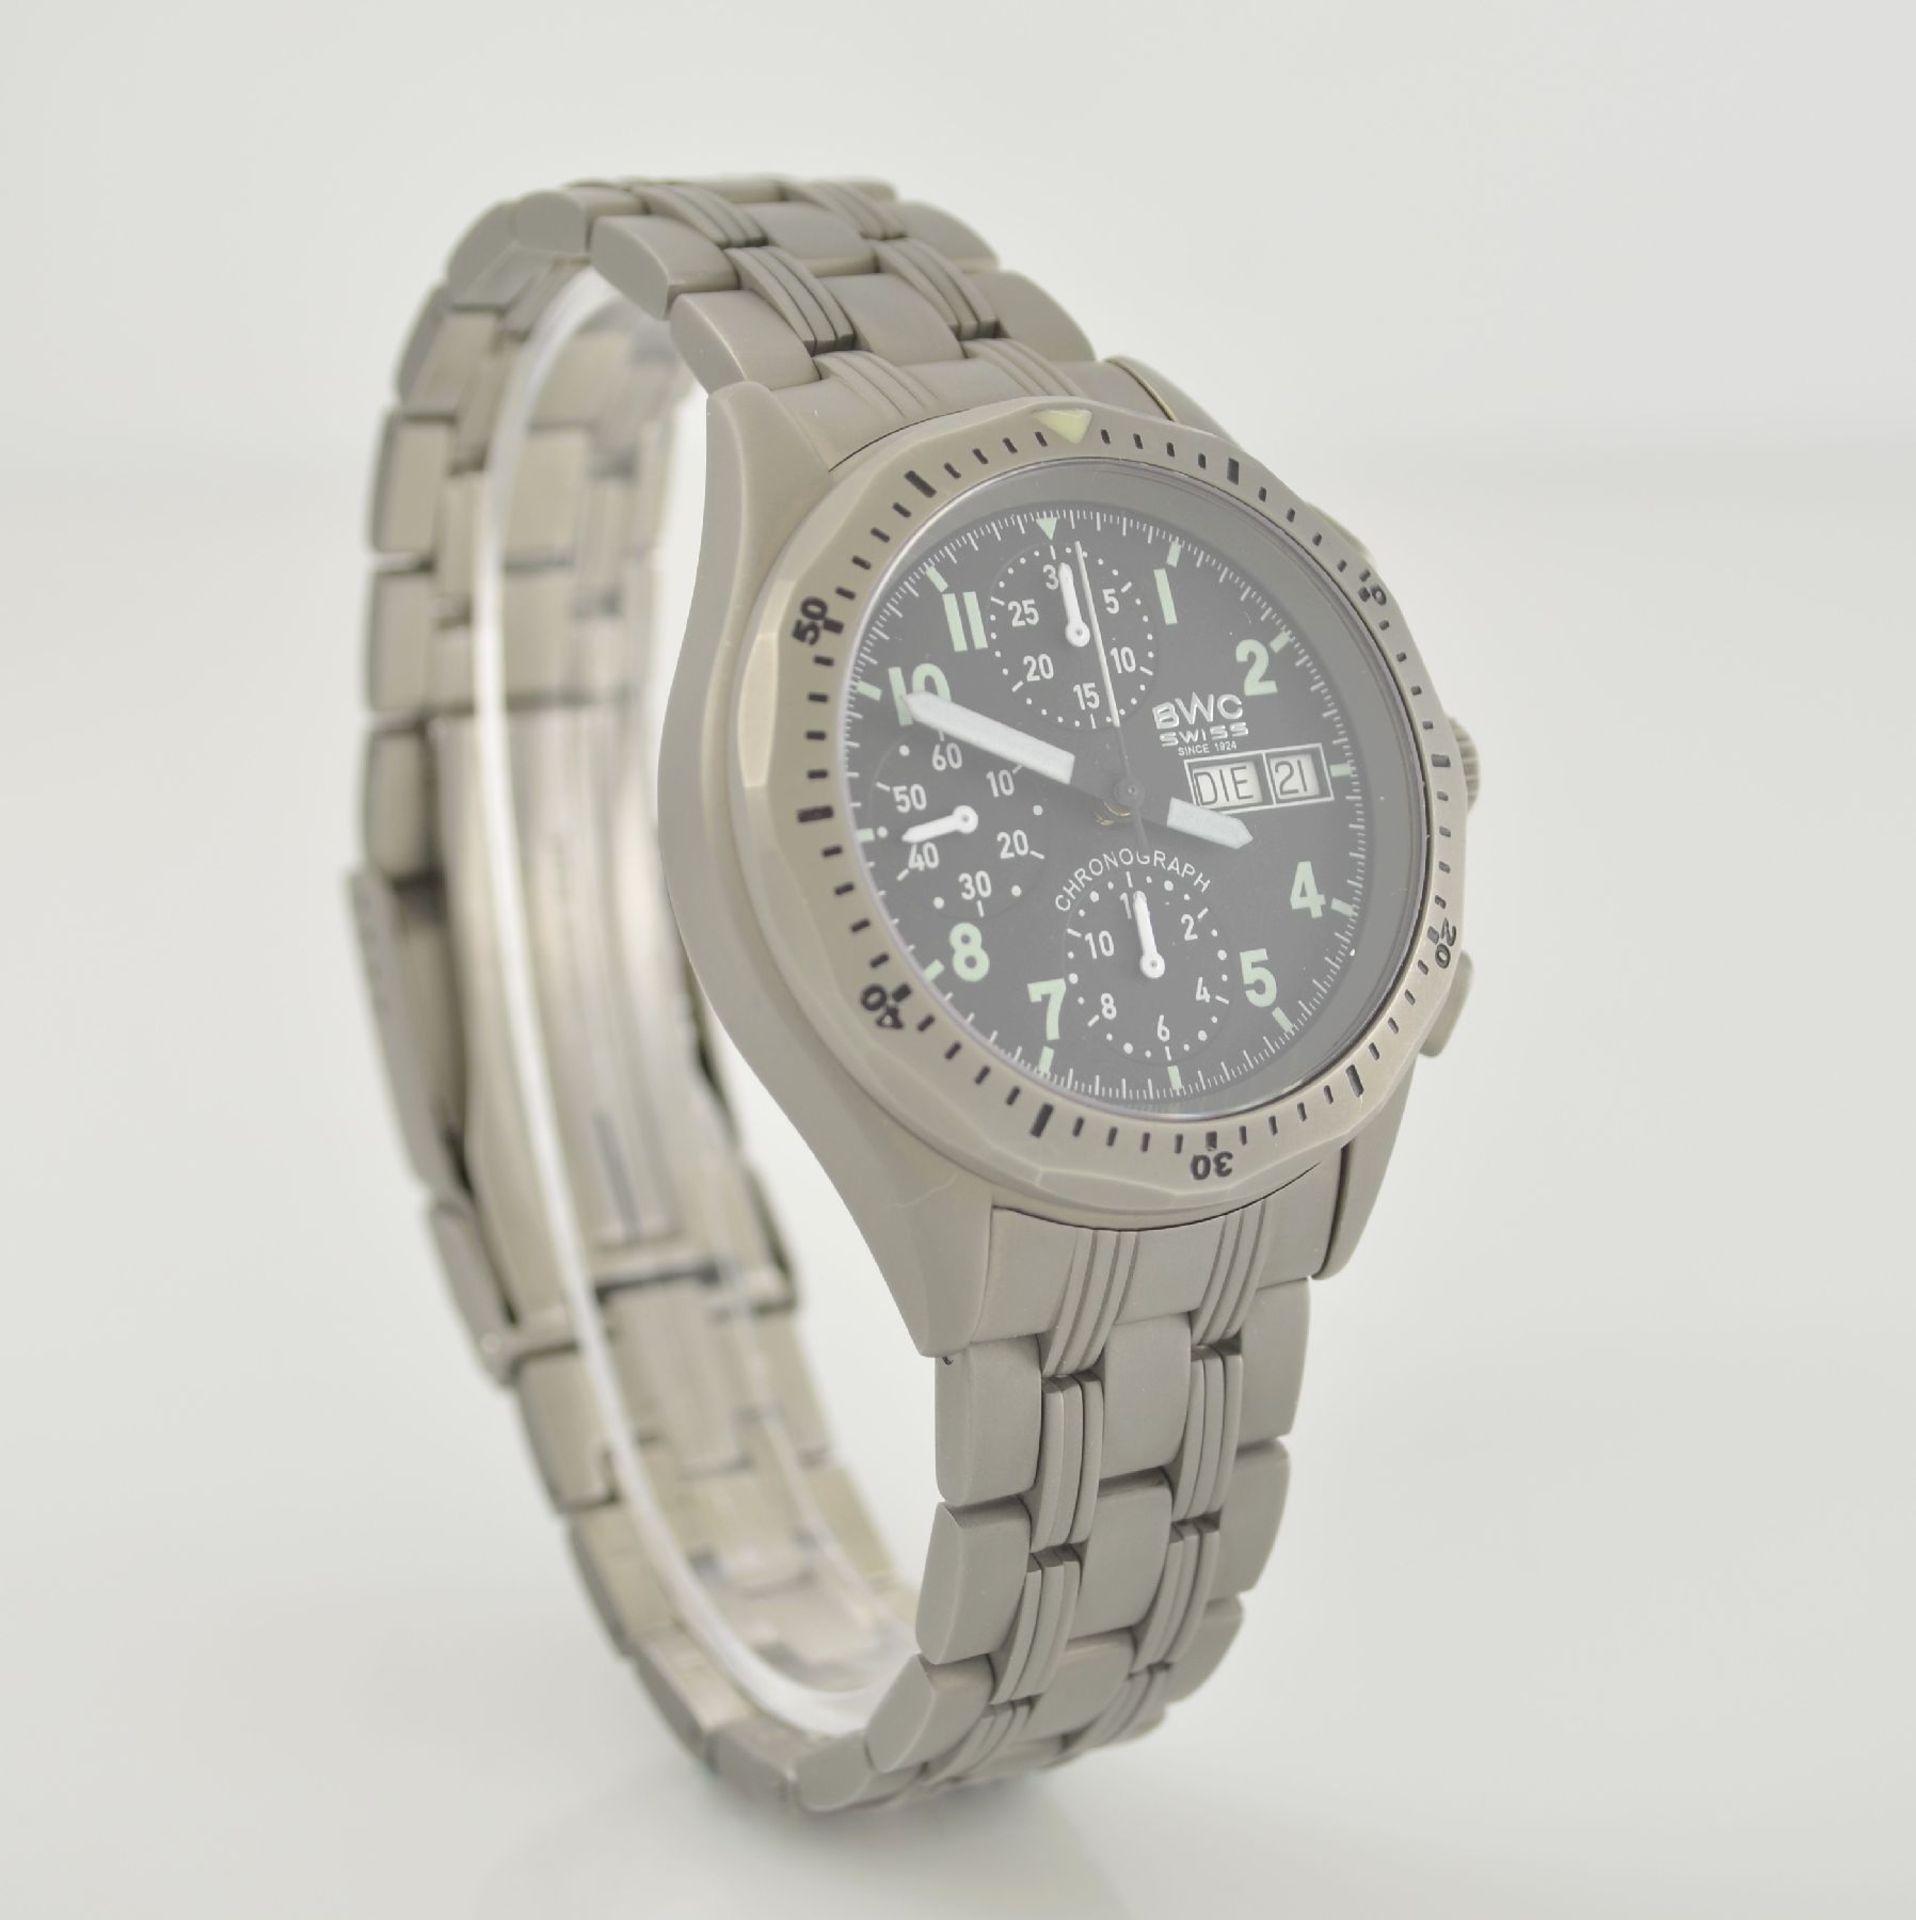 BWC Armbandchronograph, Automatik, Schweiz um 2010, matt. Edelstahlgeh. inkl. orig. Gliederband m. - Bild 4 aus 7